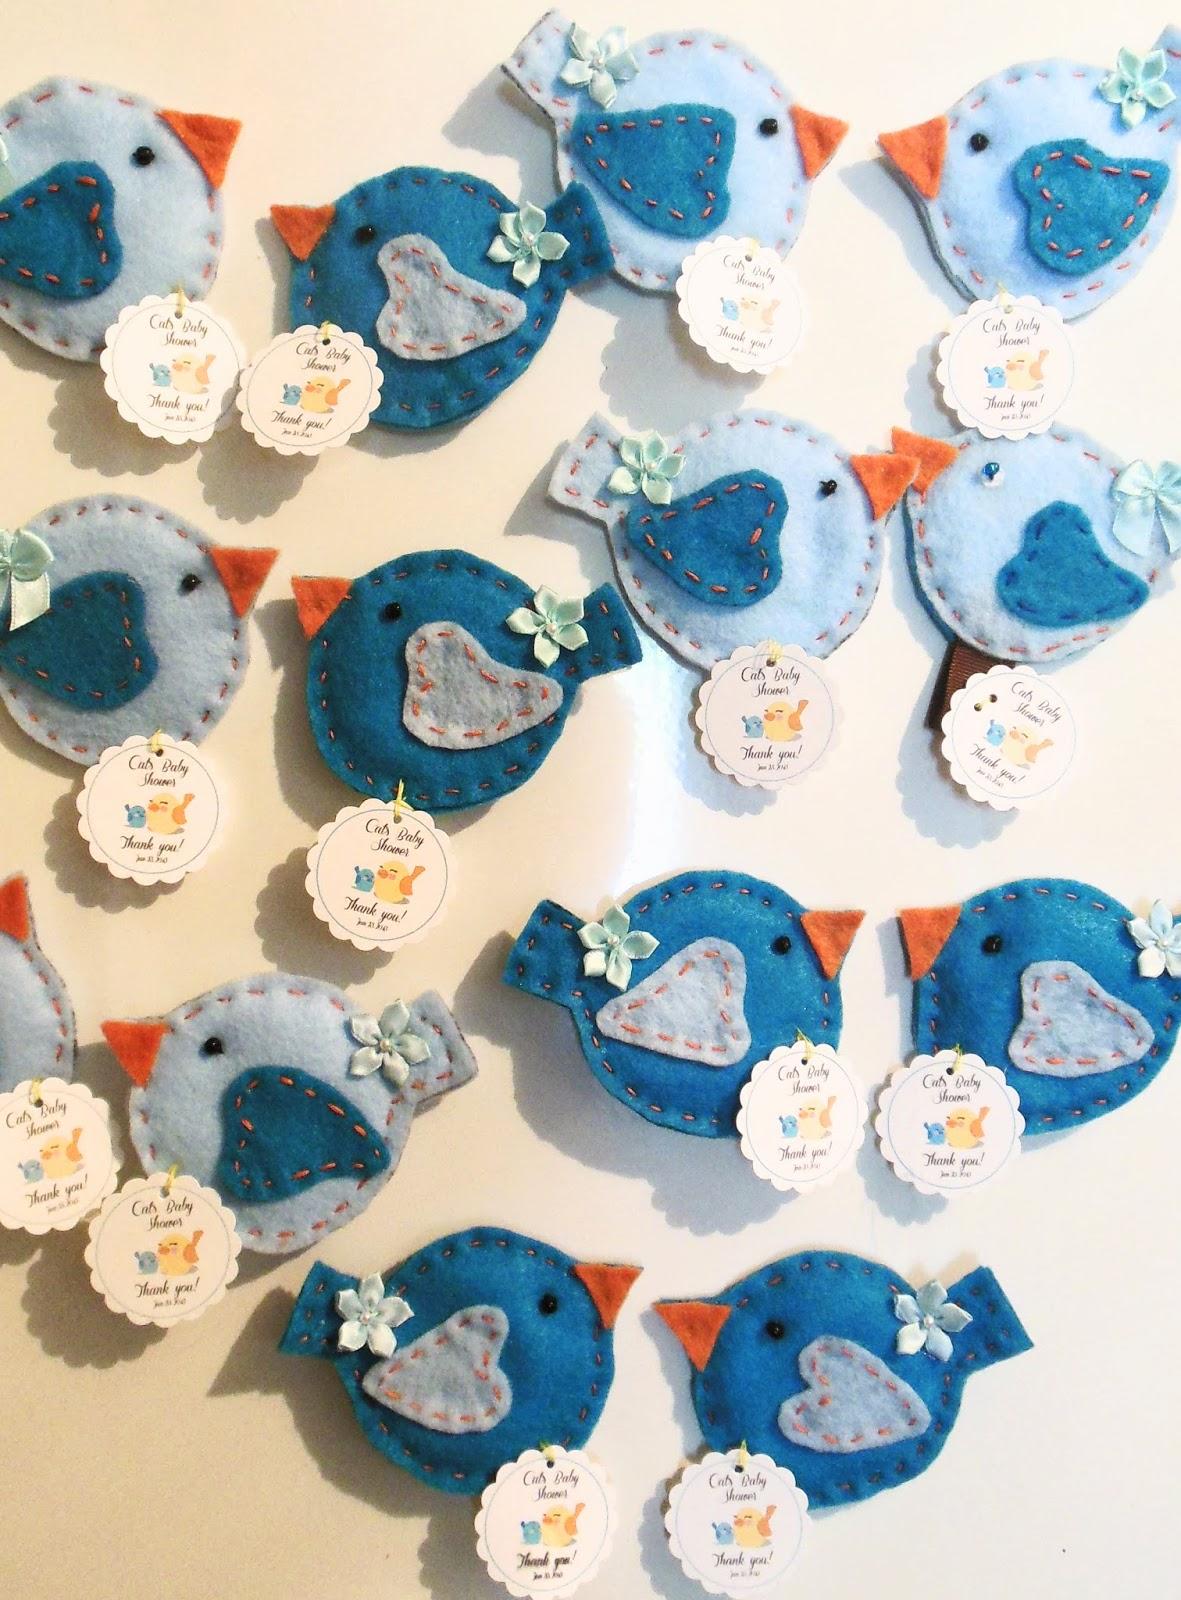 Ana Silk Flowers How To Make Felt Bird Crafts For Boy